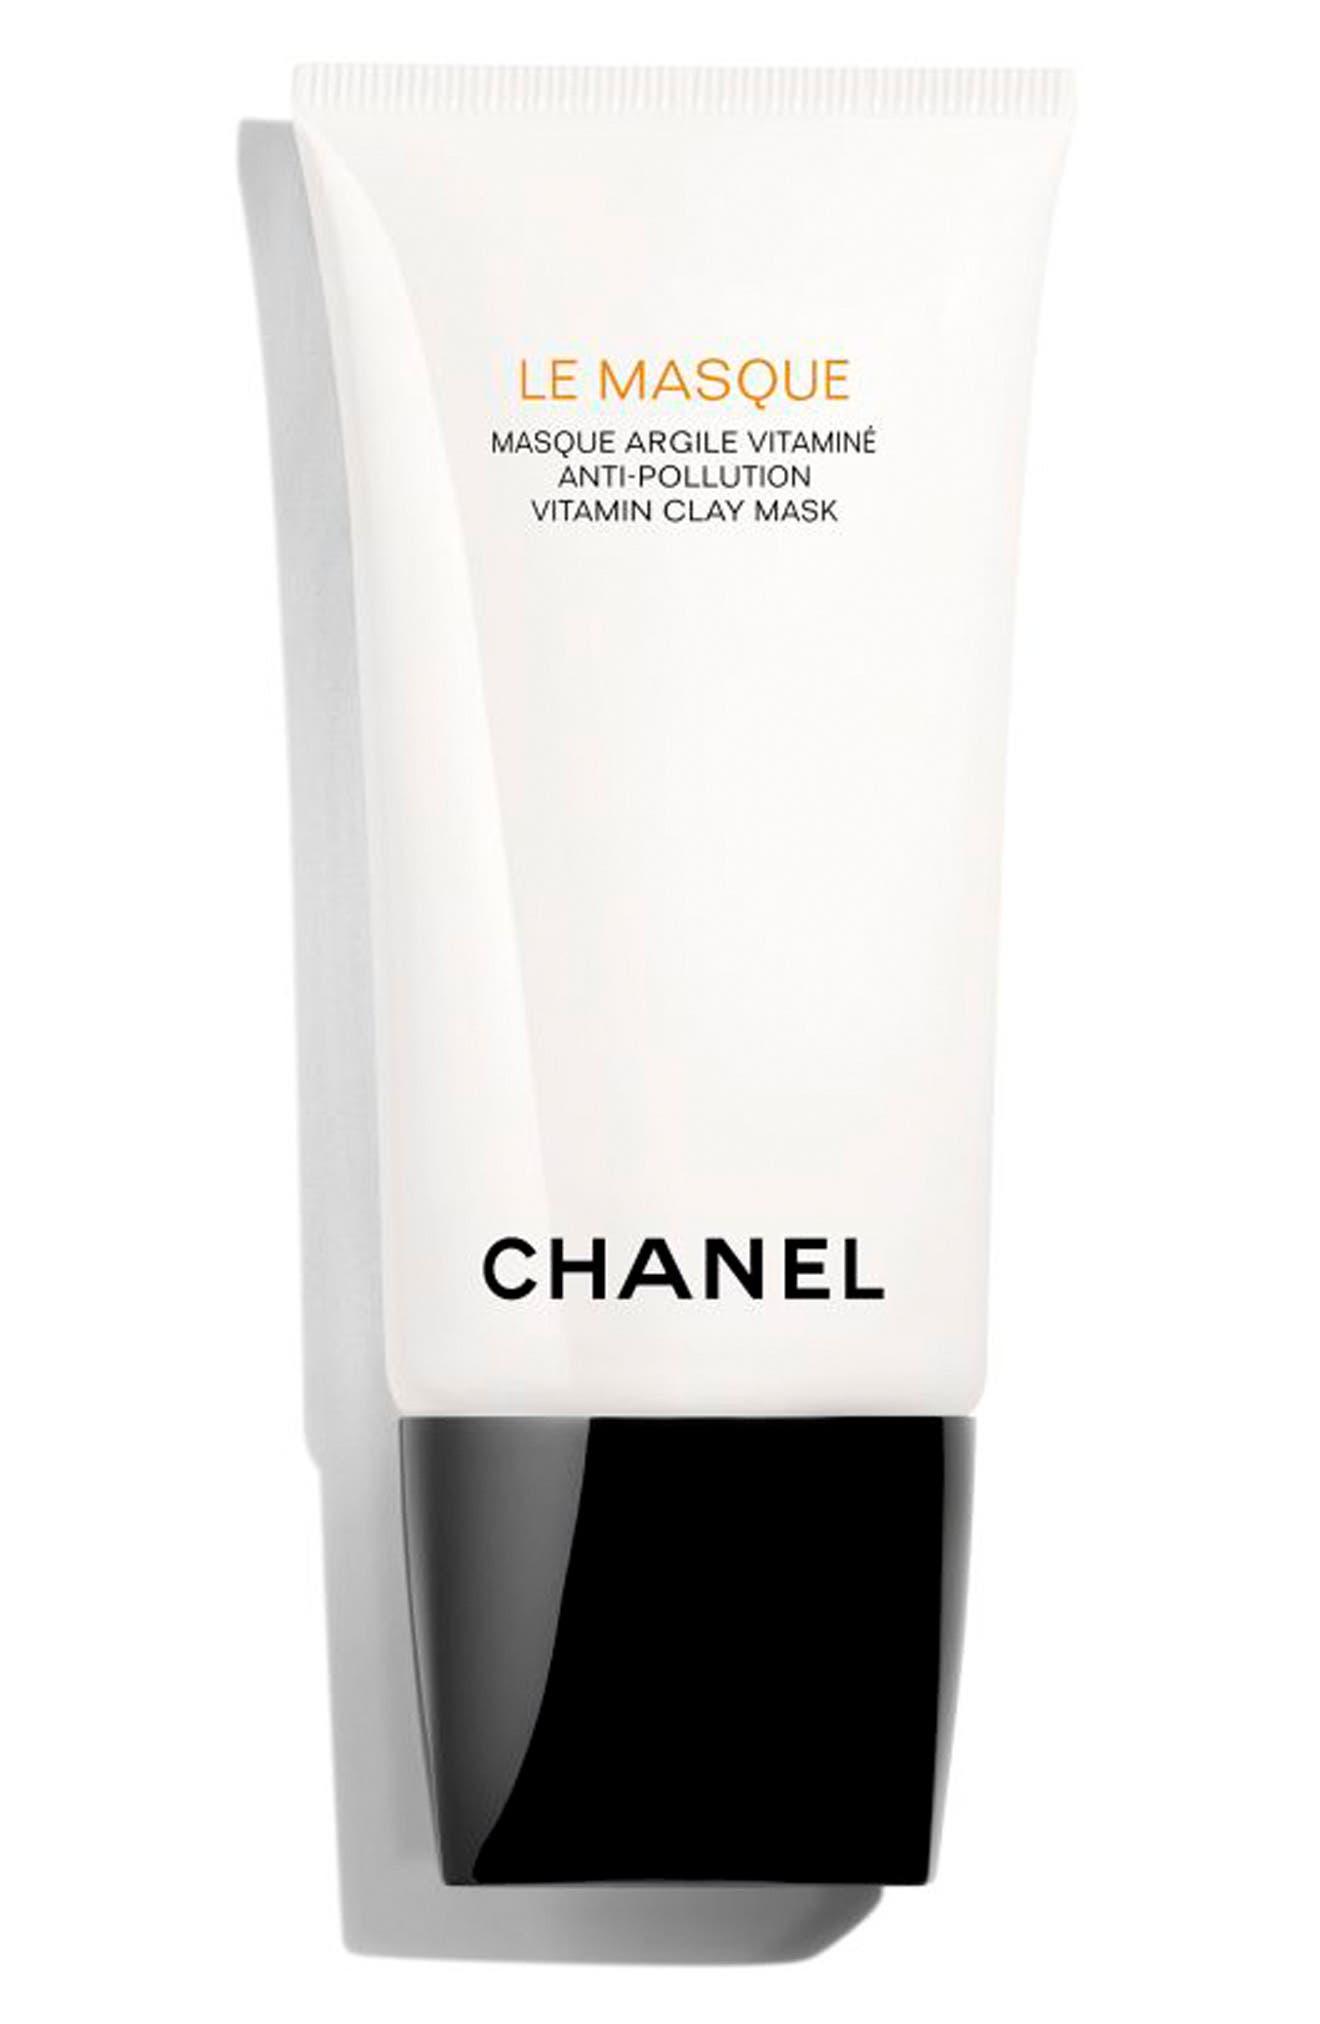 CHANEL LE MASQUE Anti-Pollution Vitamin Clay Mask | Nordstrom